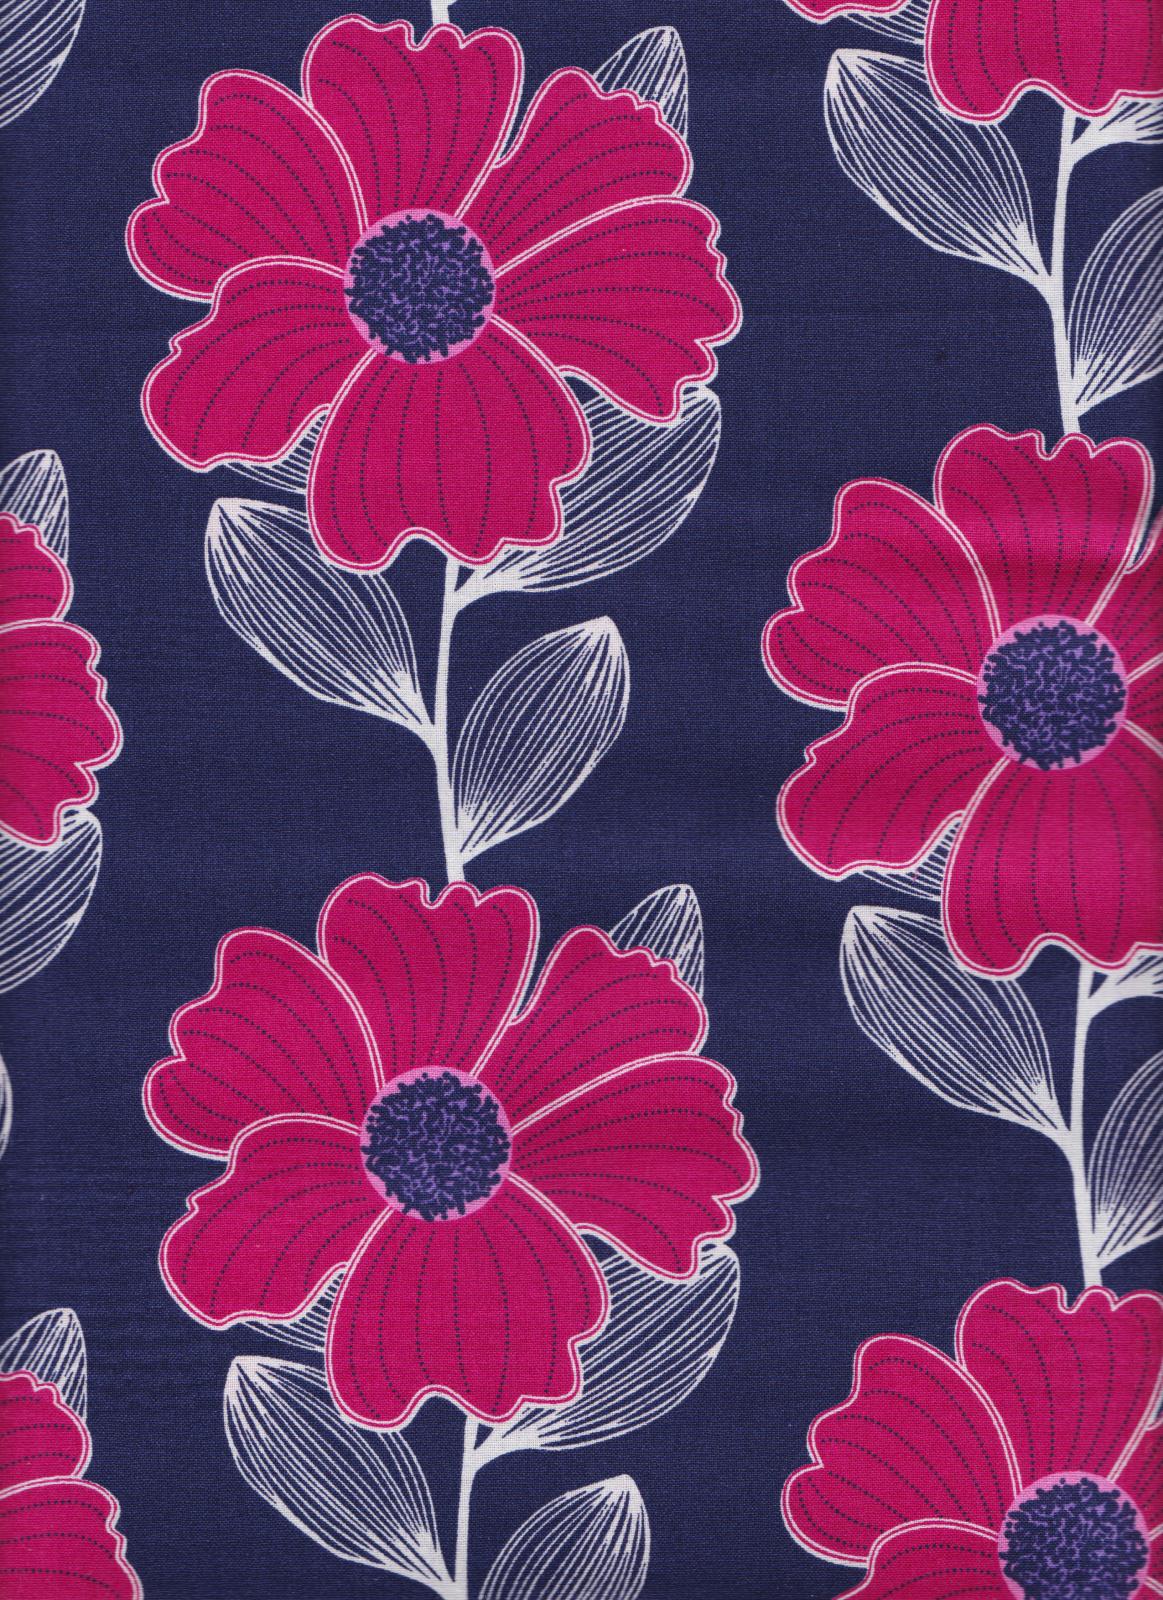 PROMO* CF-Anchors Away 4140501WM-01 Blue - Pink Flowers